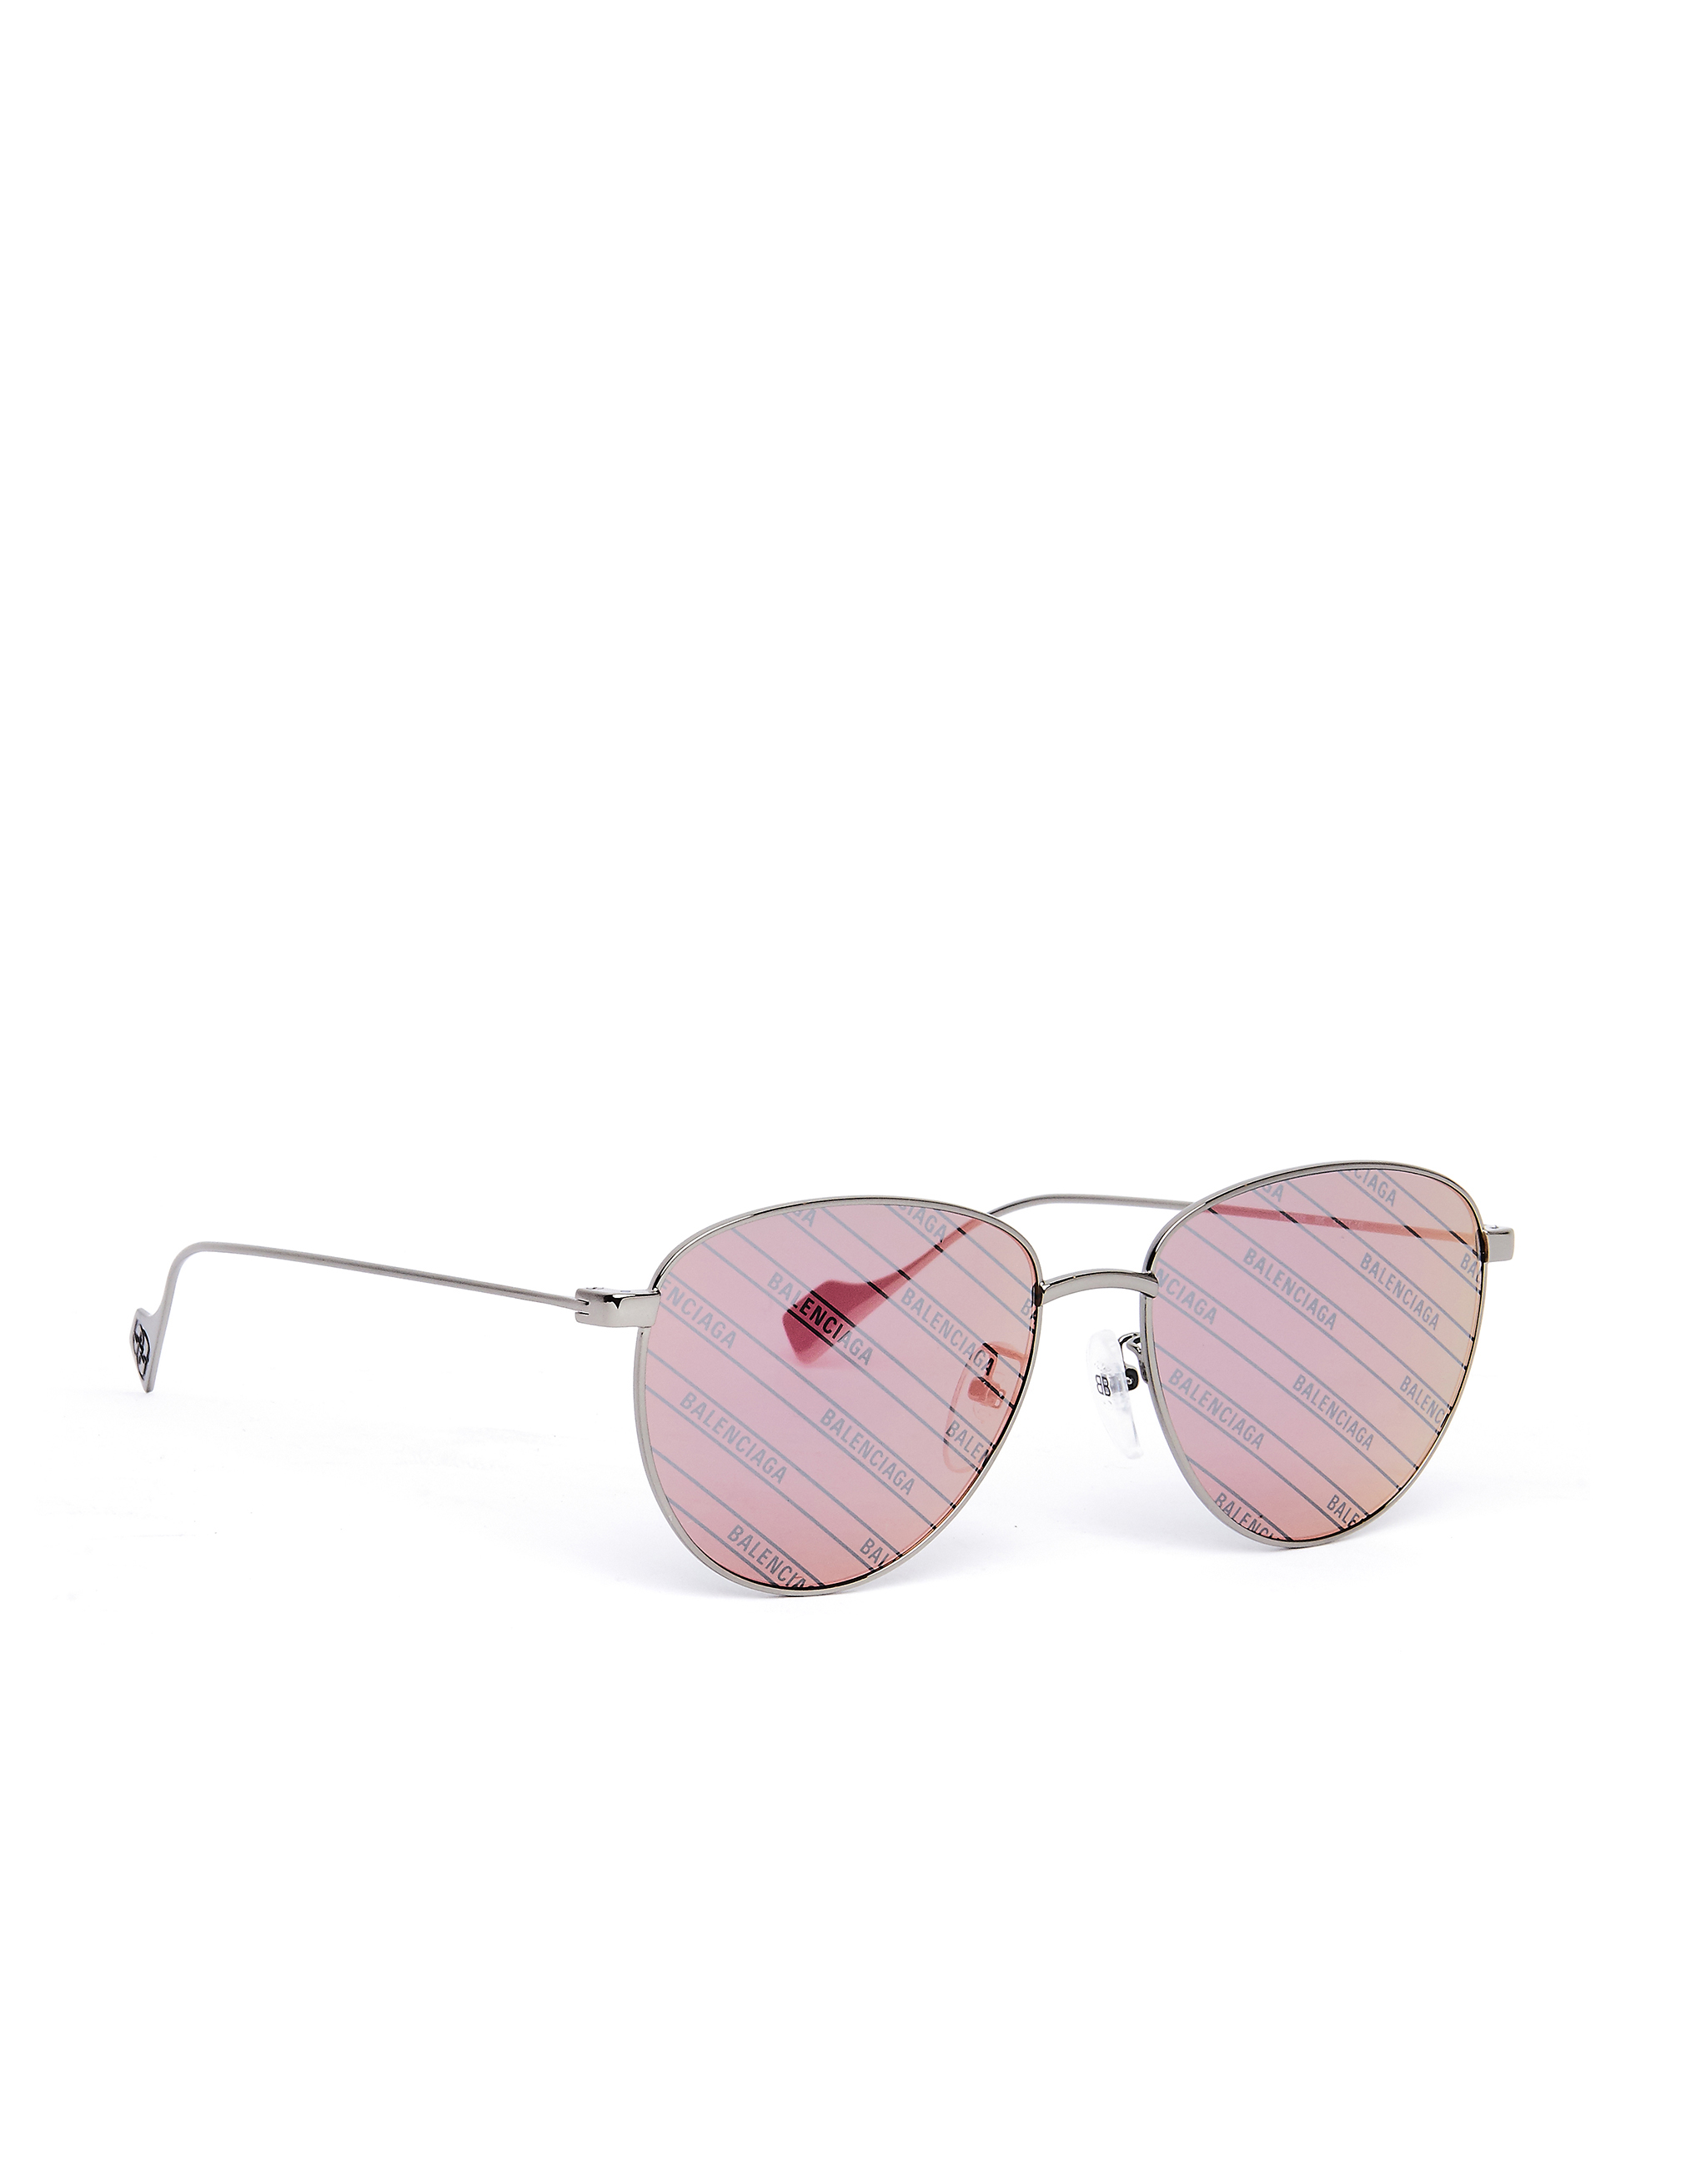 Balenciaga Mirrored Logo Printed Invisible Sunglasses